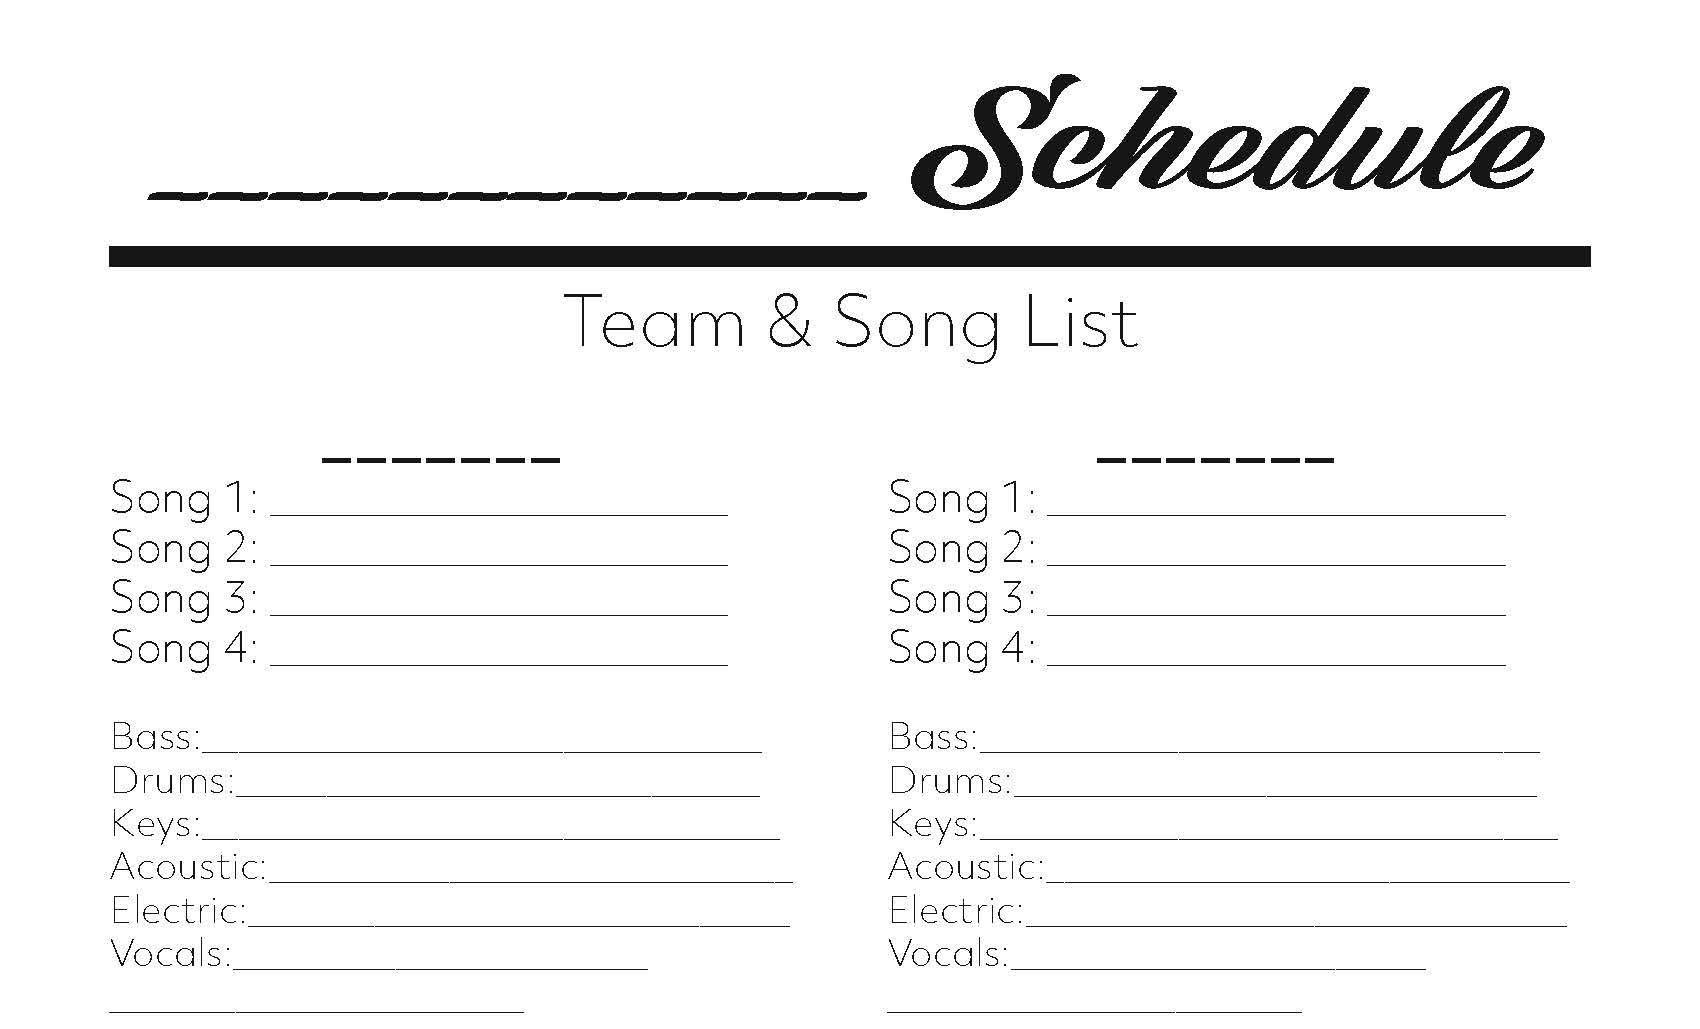 Schedule Template - Worship